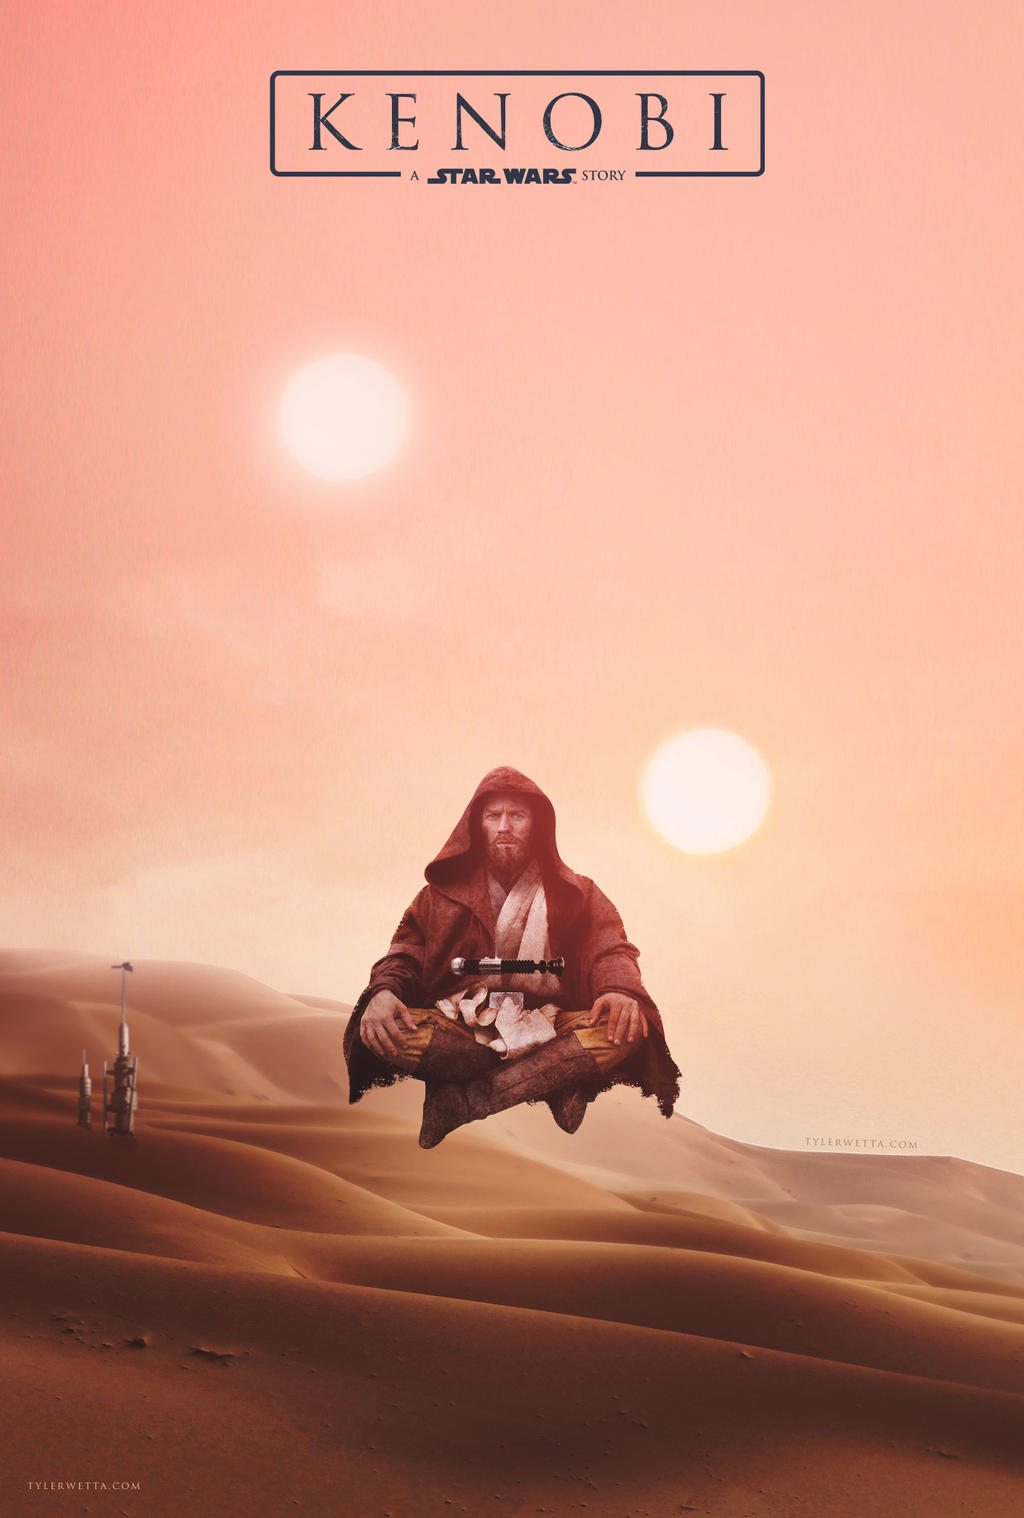 Kenobi: A Star Wars Story Movie Poster